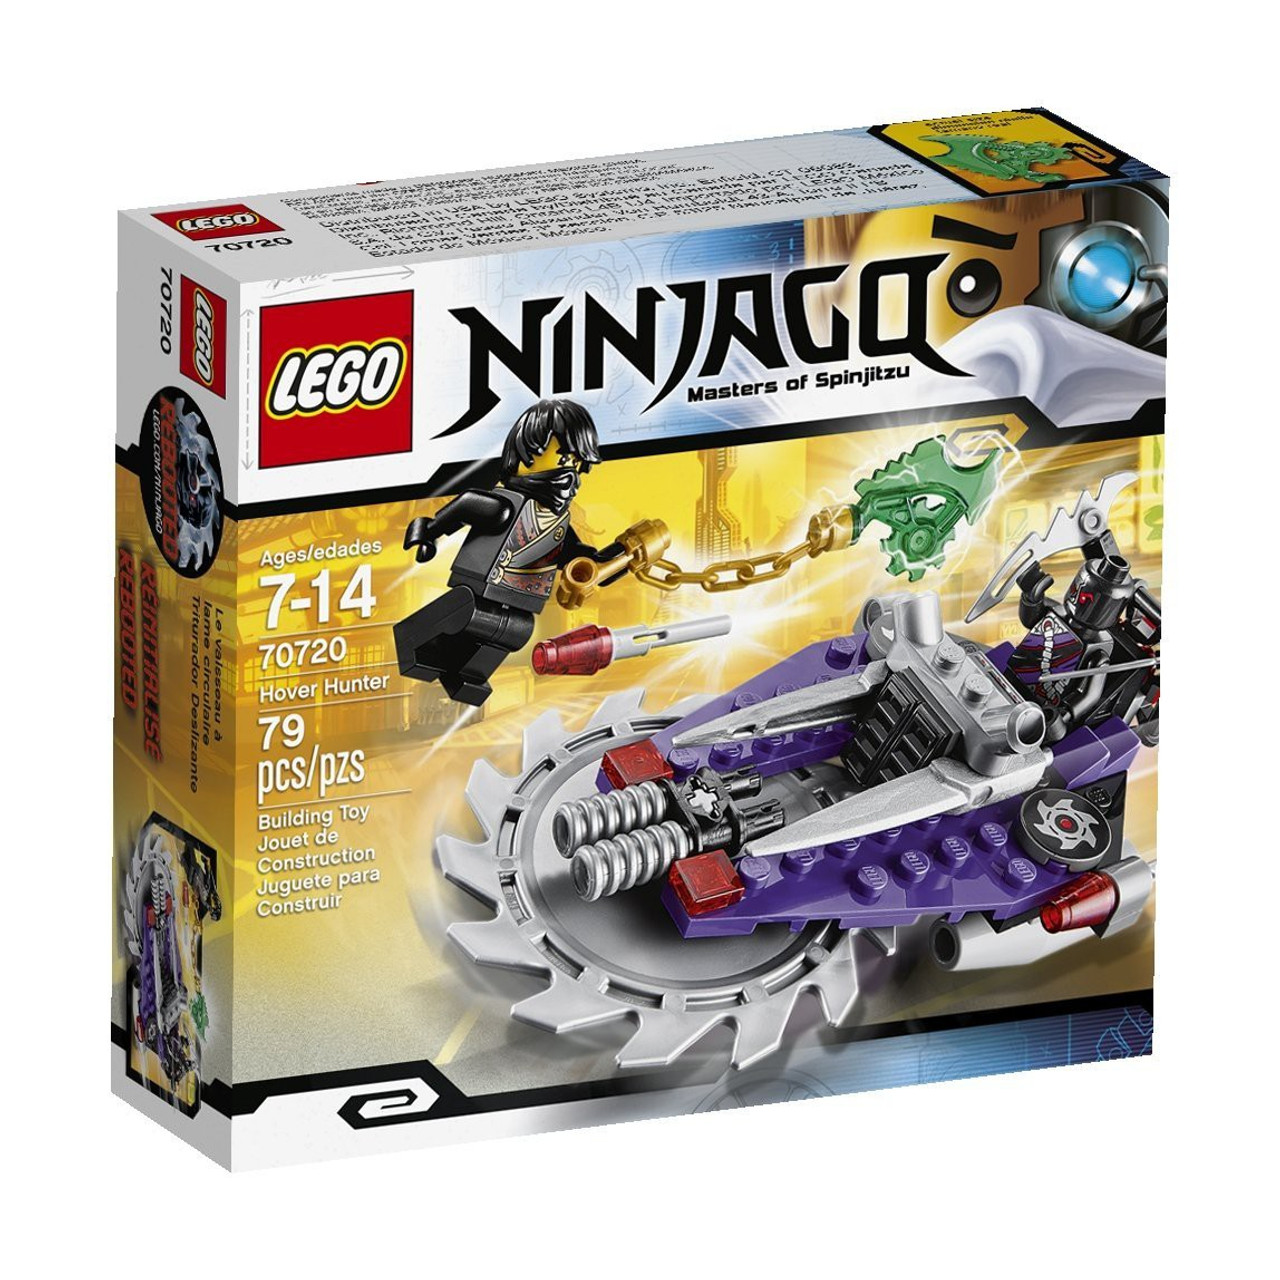 LEGO Ninjago Rebooted Hover Hunter Set #70720